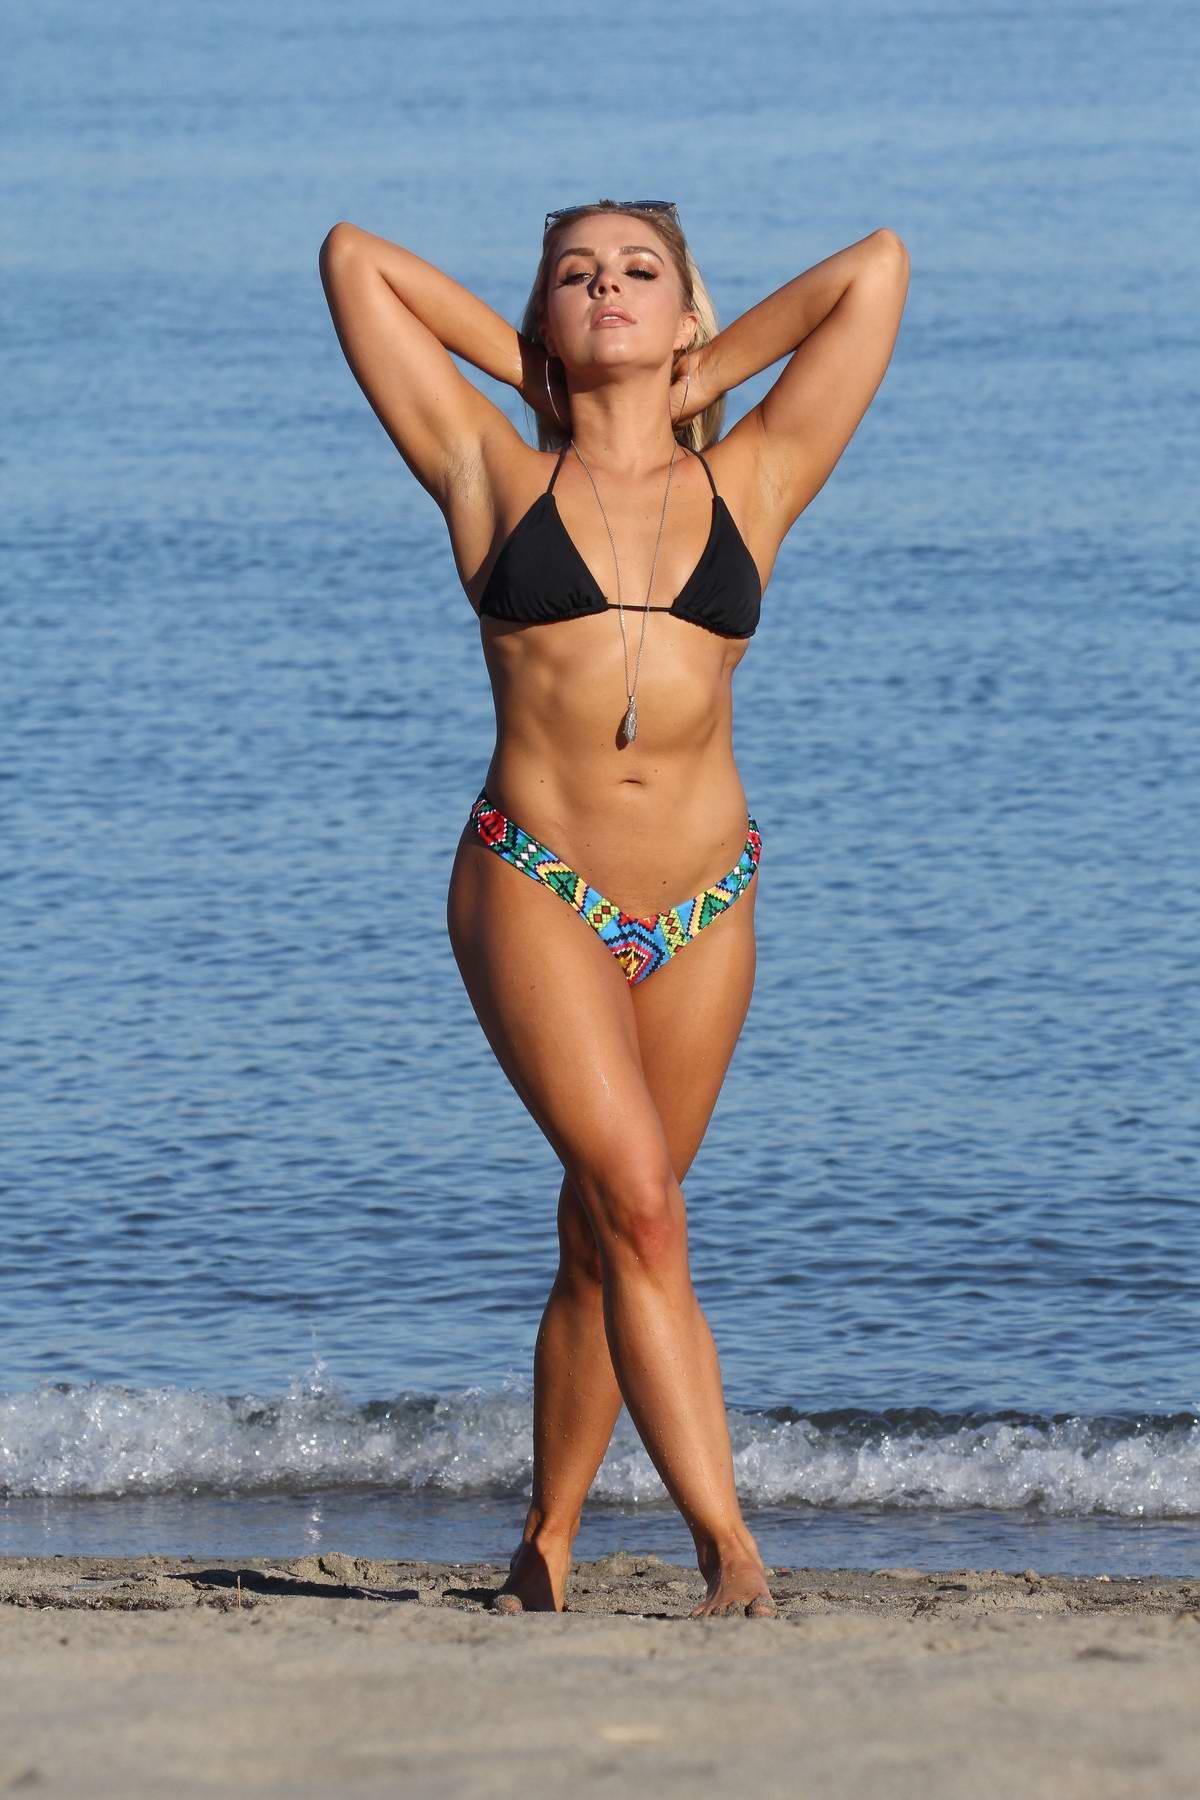 Gabby Allen in bikini enjoying the beach whilst on holiday in Marbella, Spain